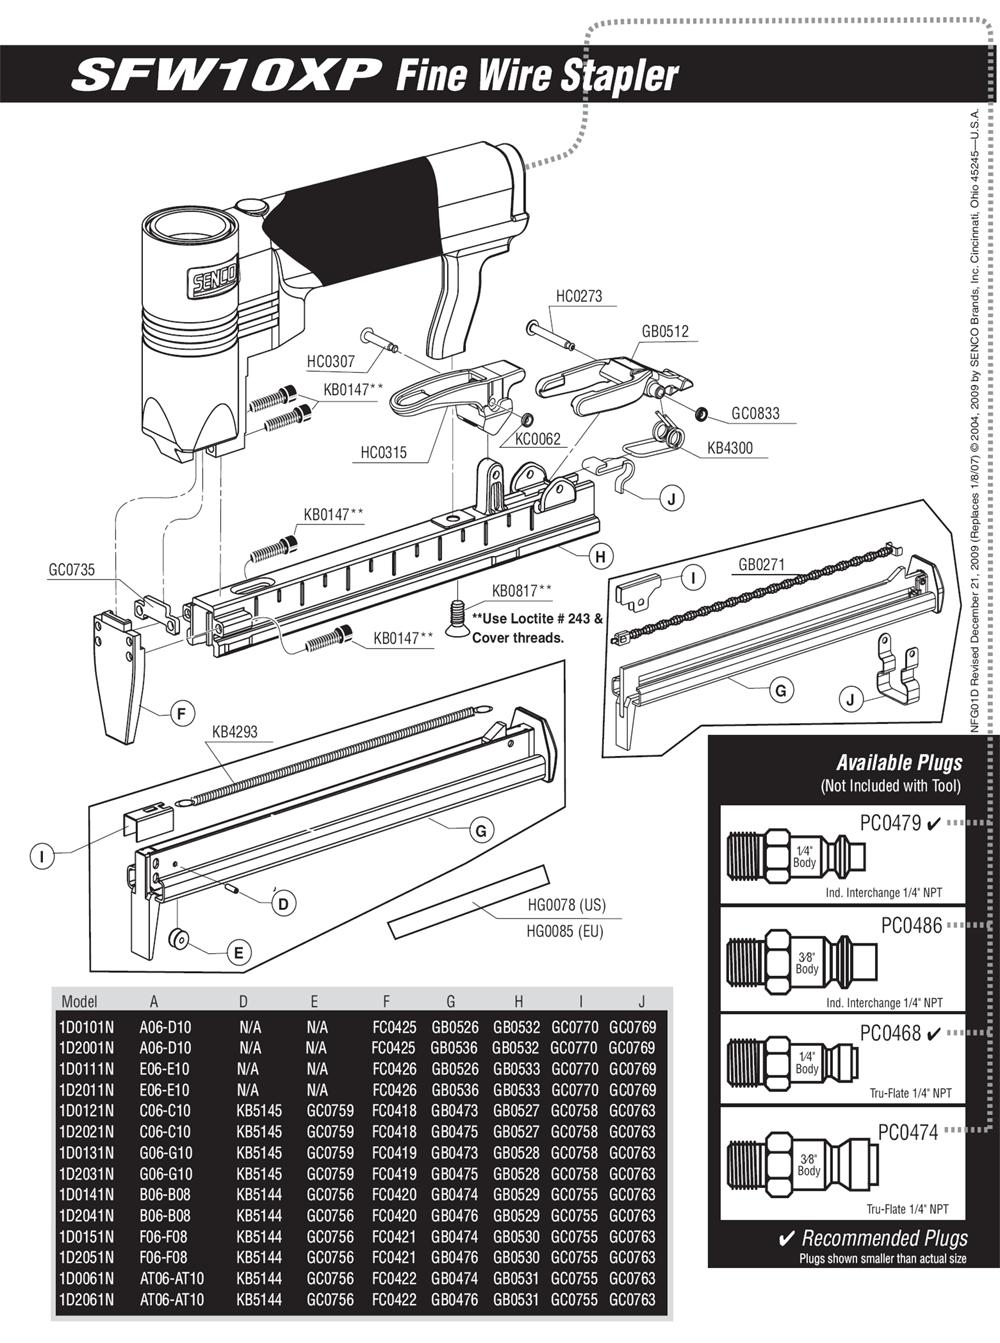 1D0141N-senco-PB-1Break Down